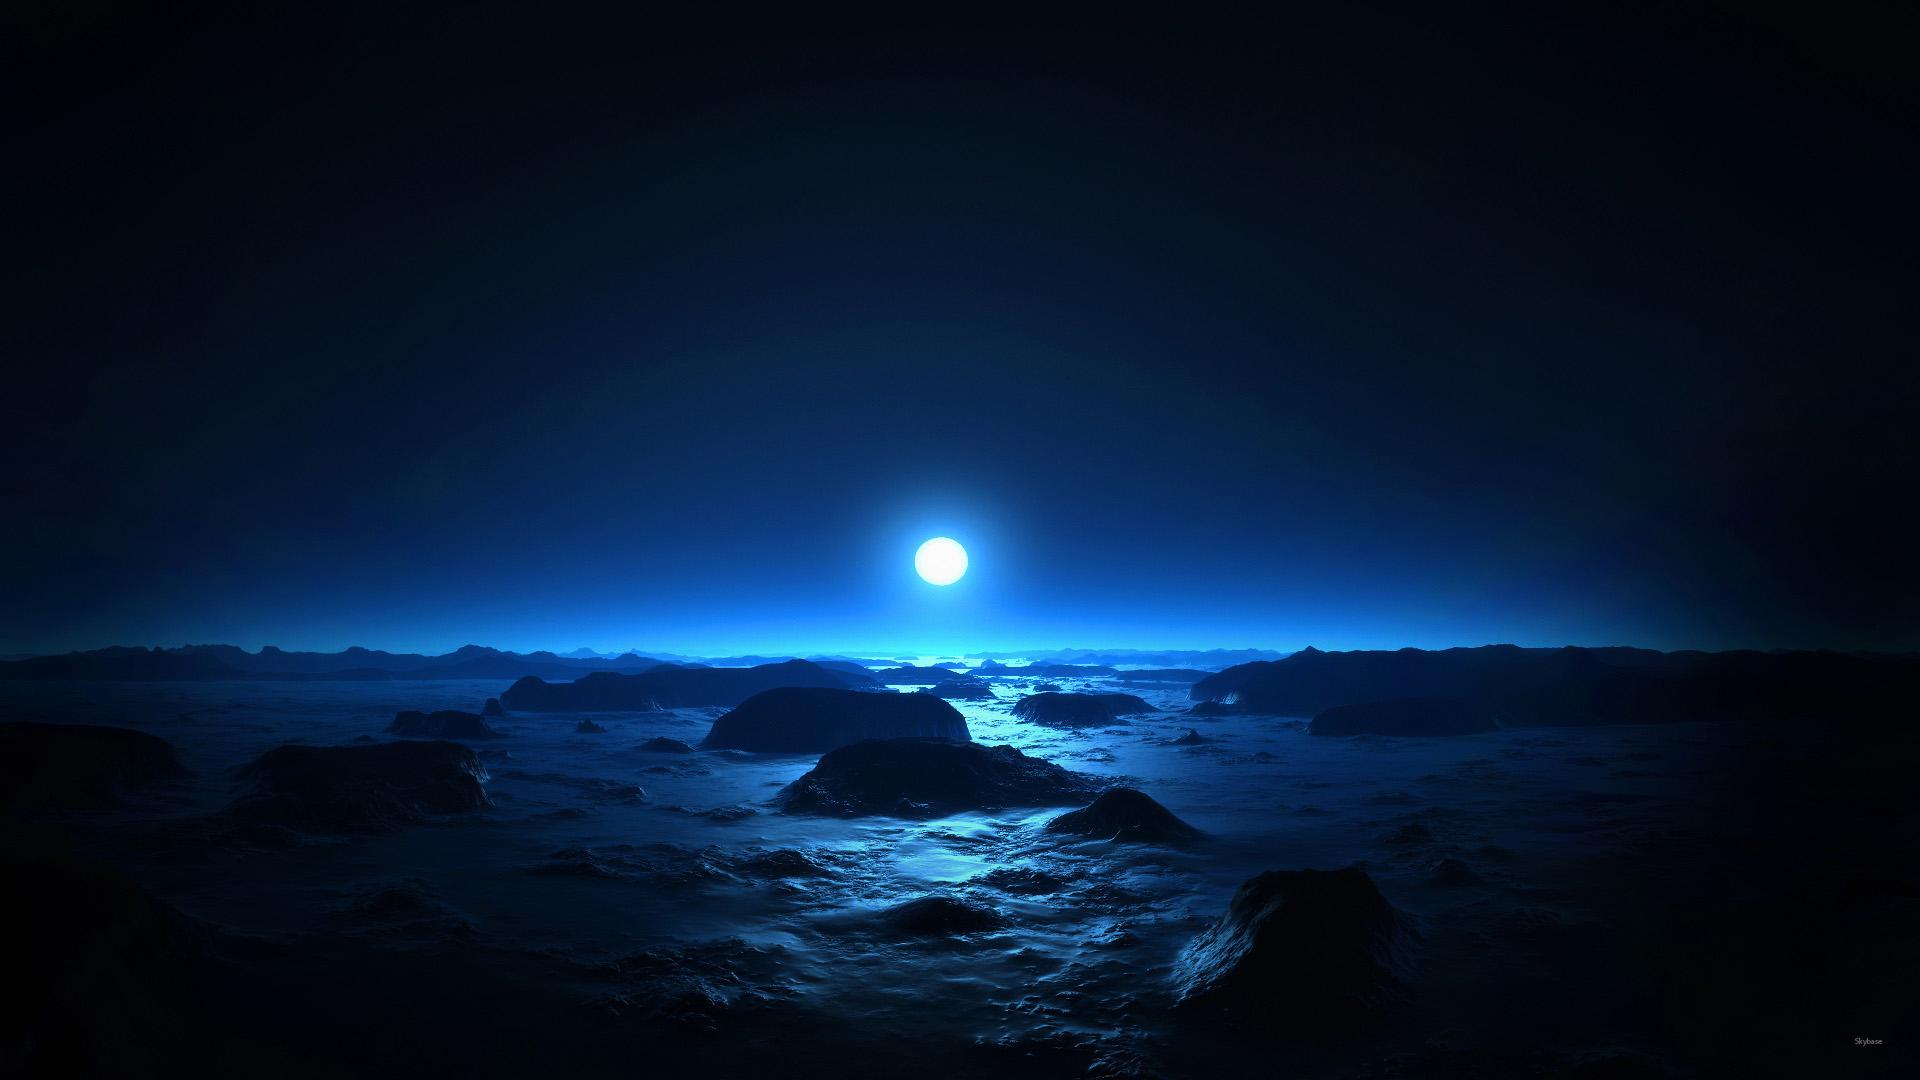 Amazing Moonlight Wallpaper